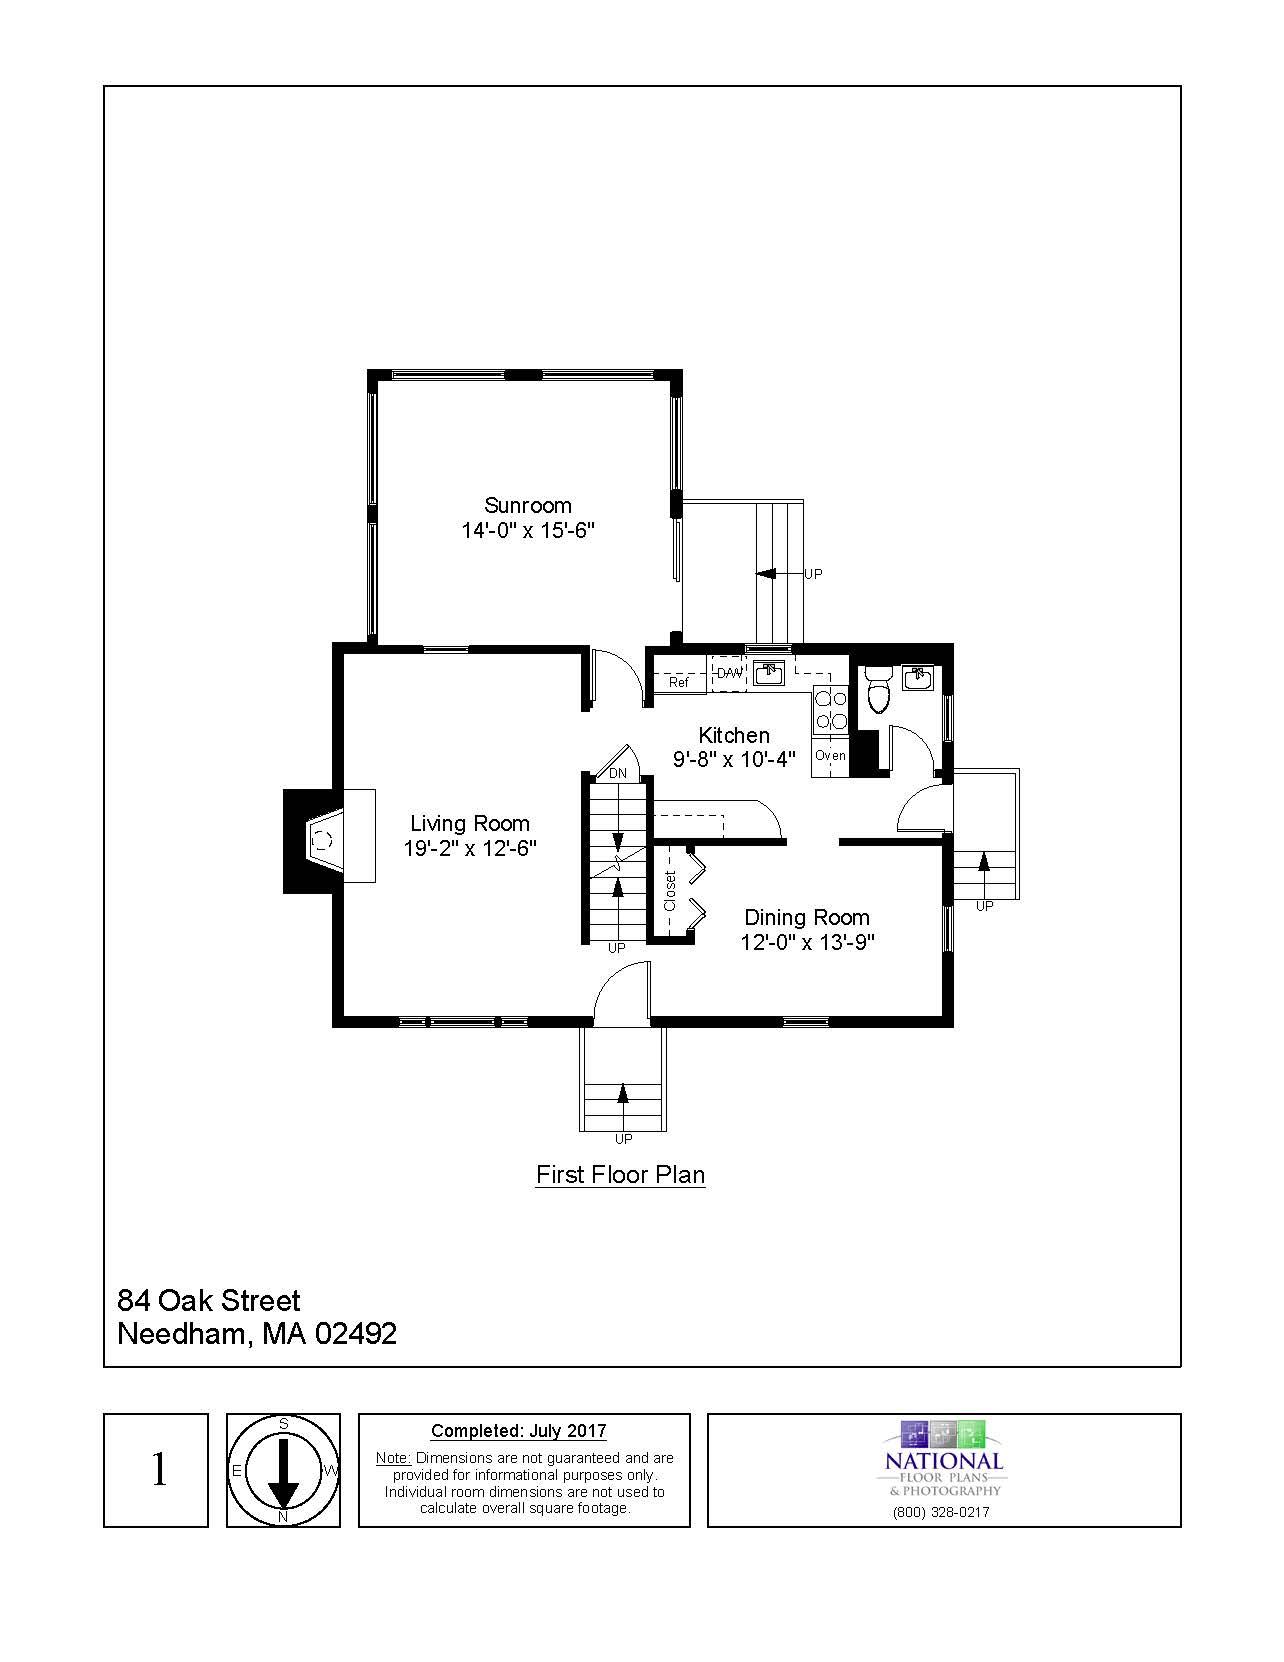 84 Oak Street, Needham, MA - Floor plan